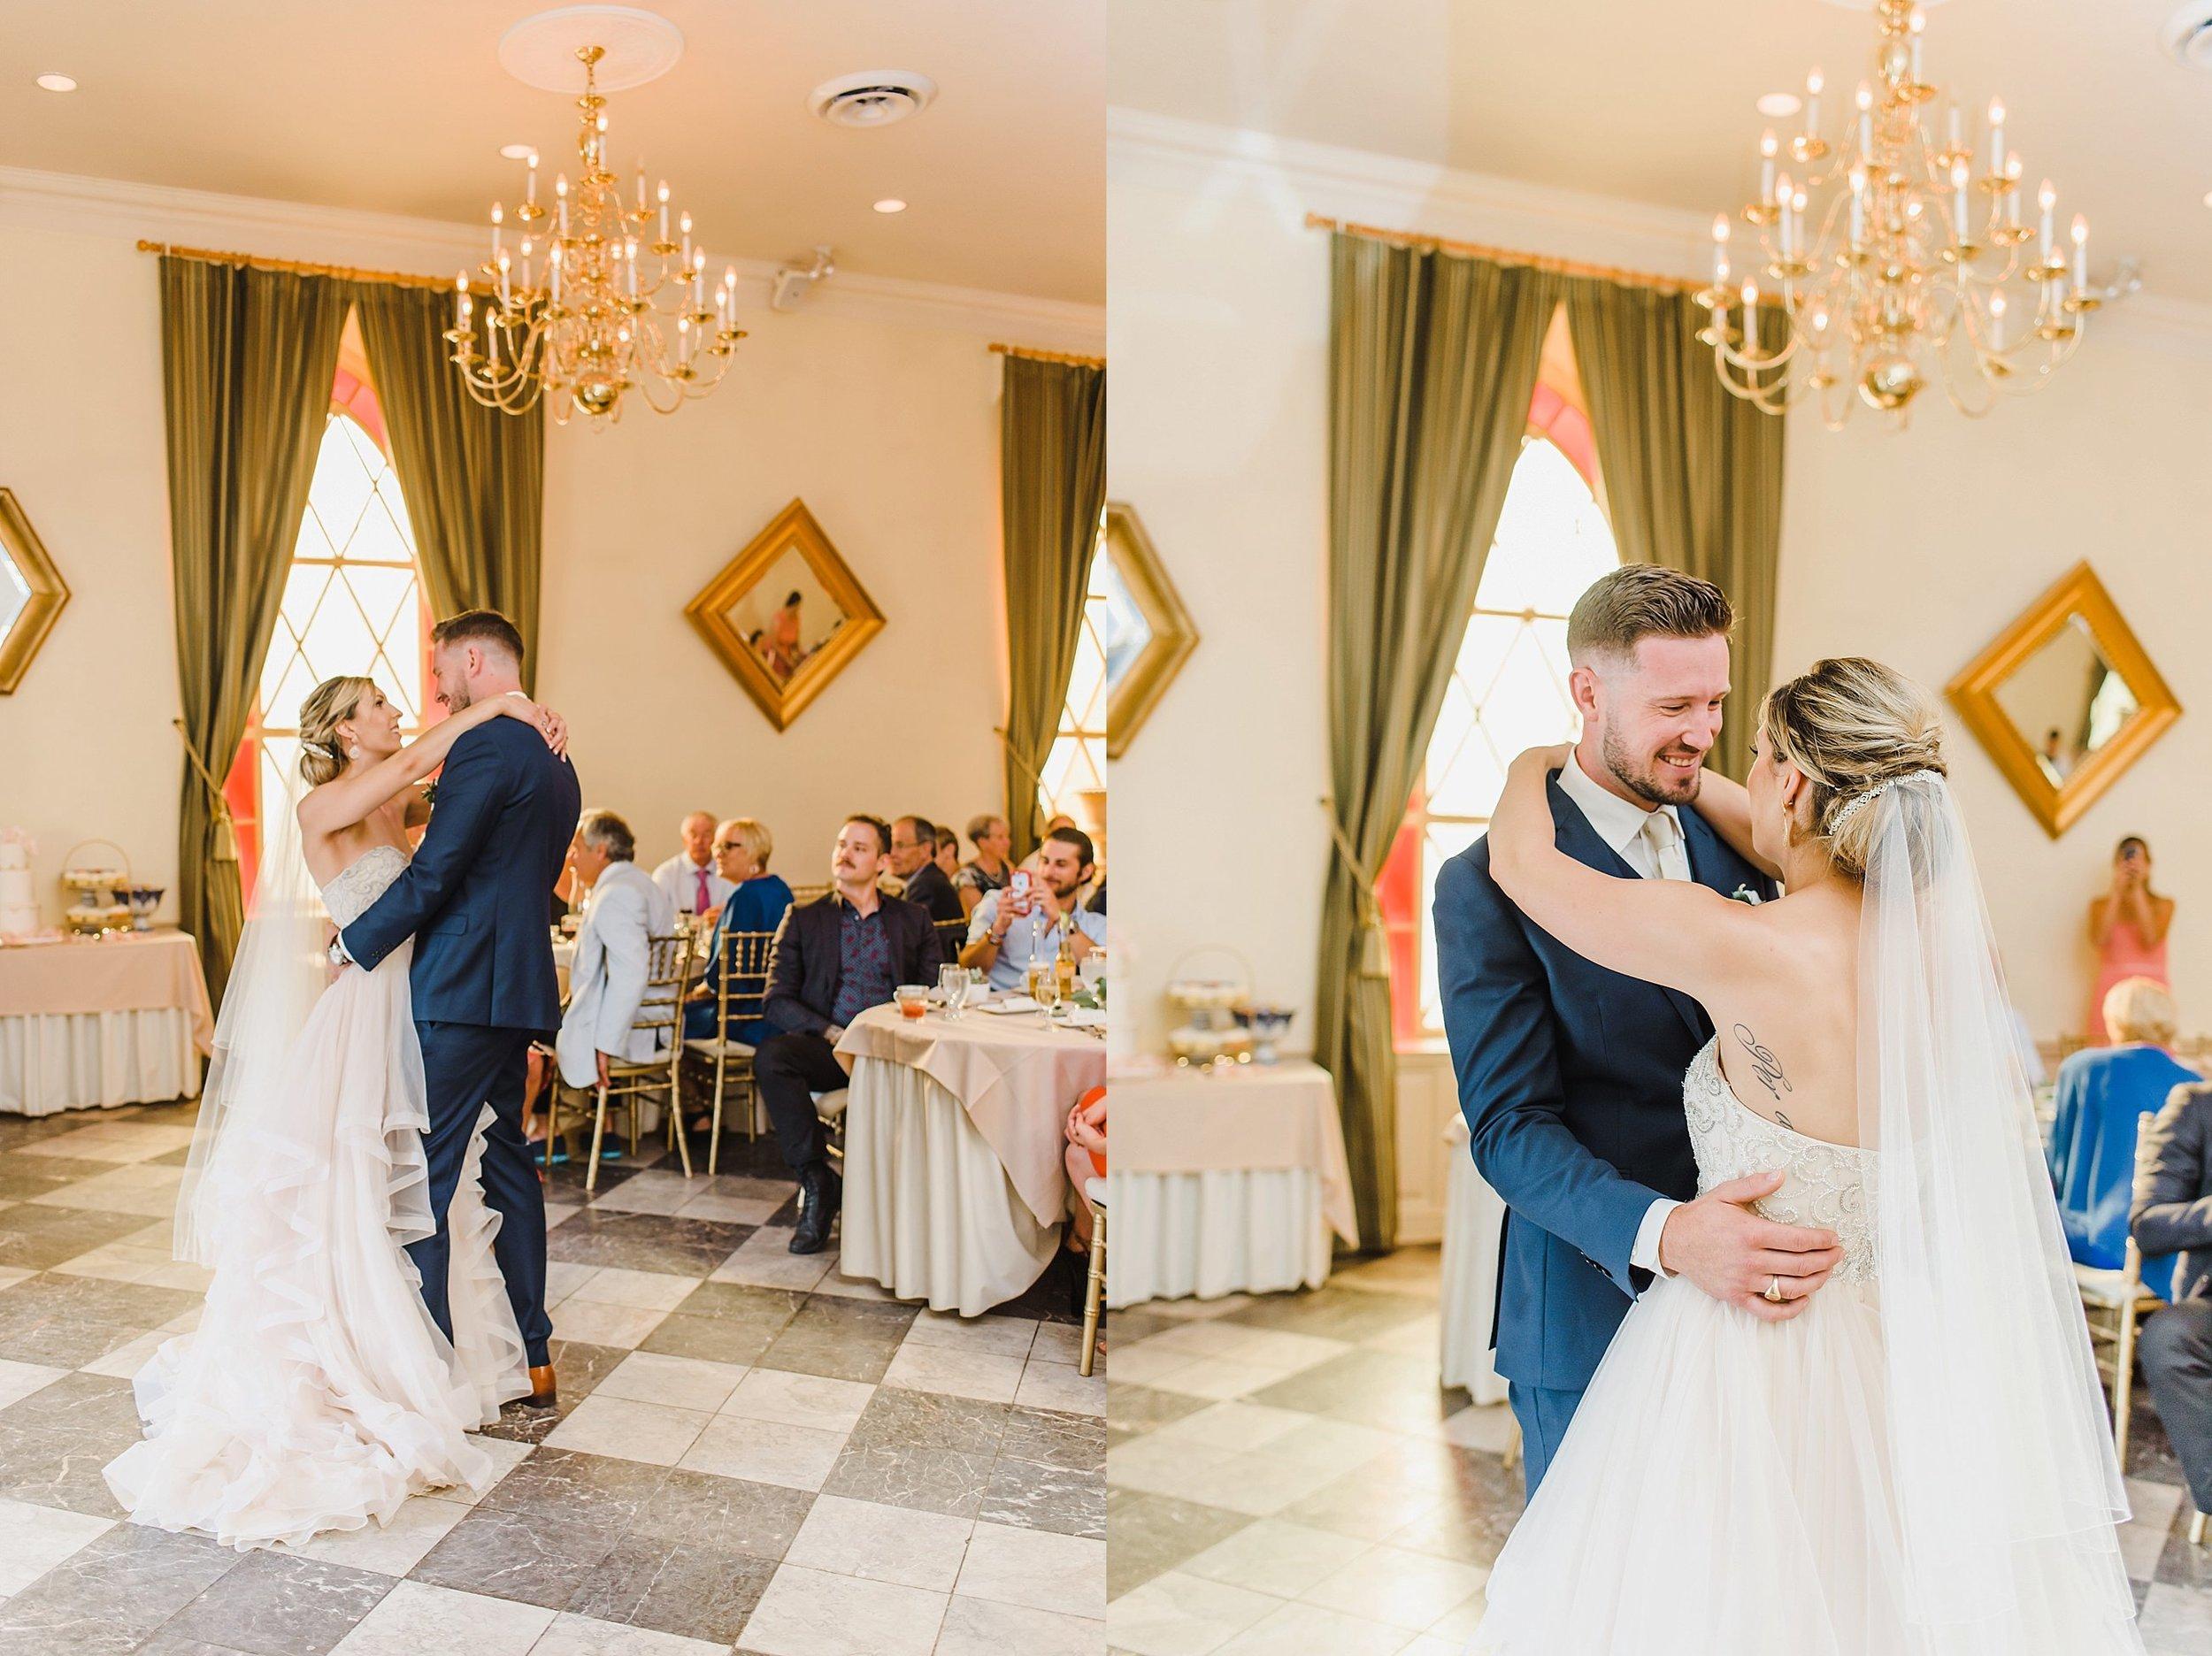 light airy indie fine art ottawa wedding photographer | Ali and Batoul Photography_0211.jpg